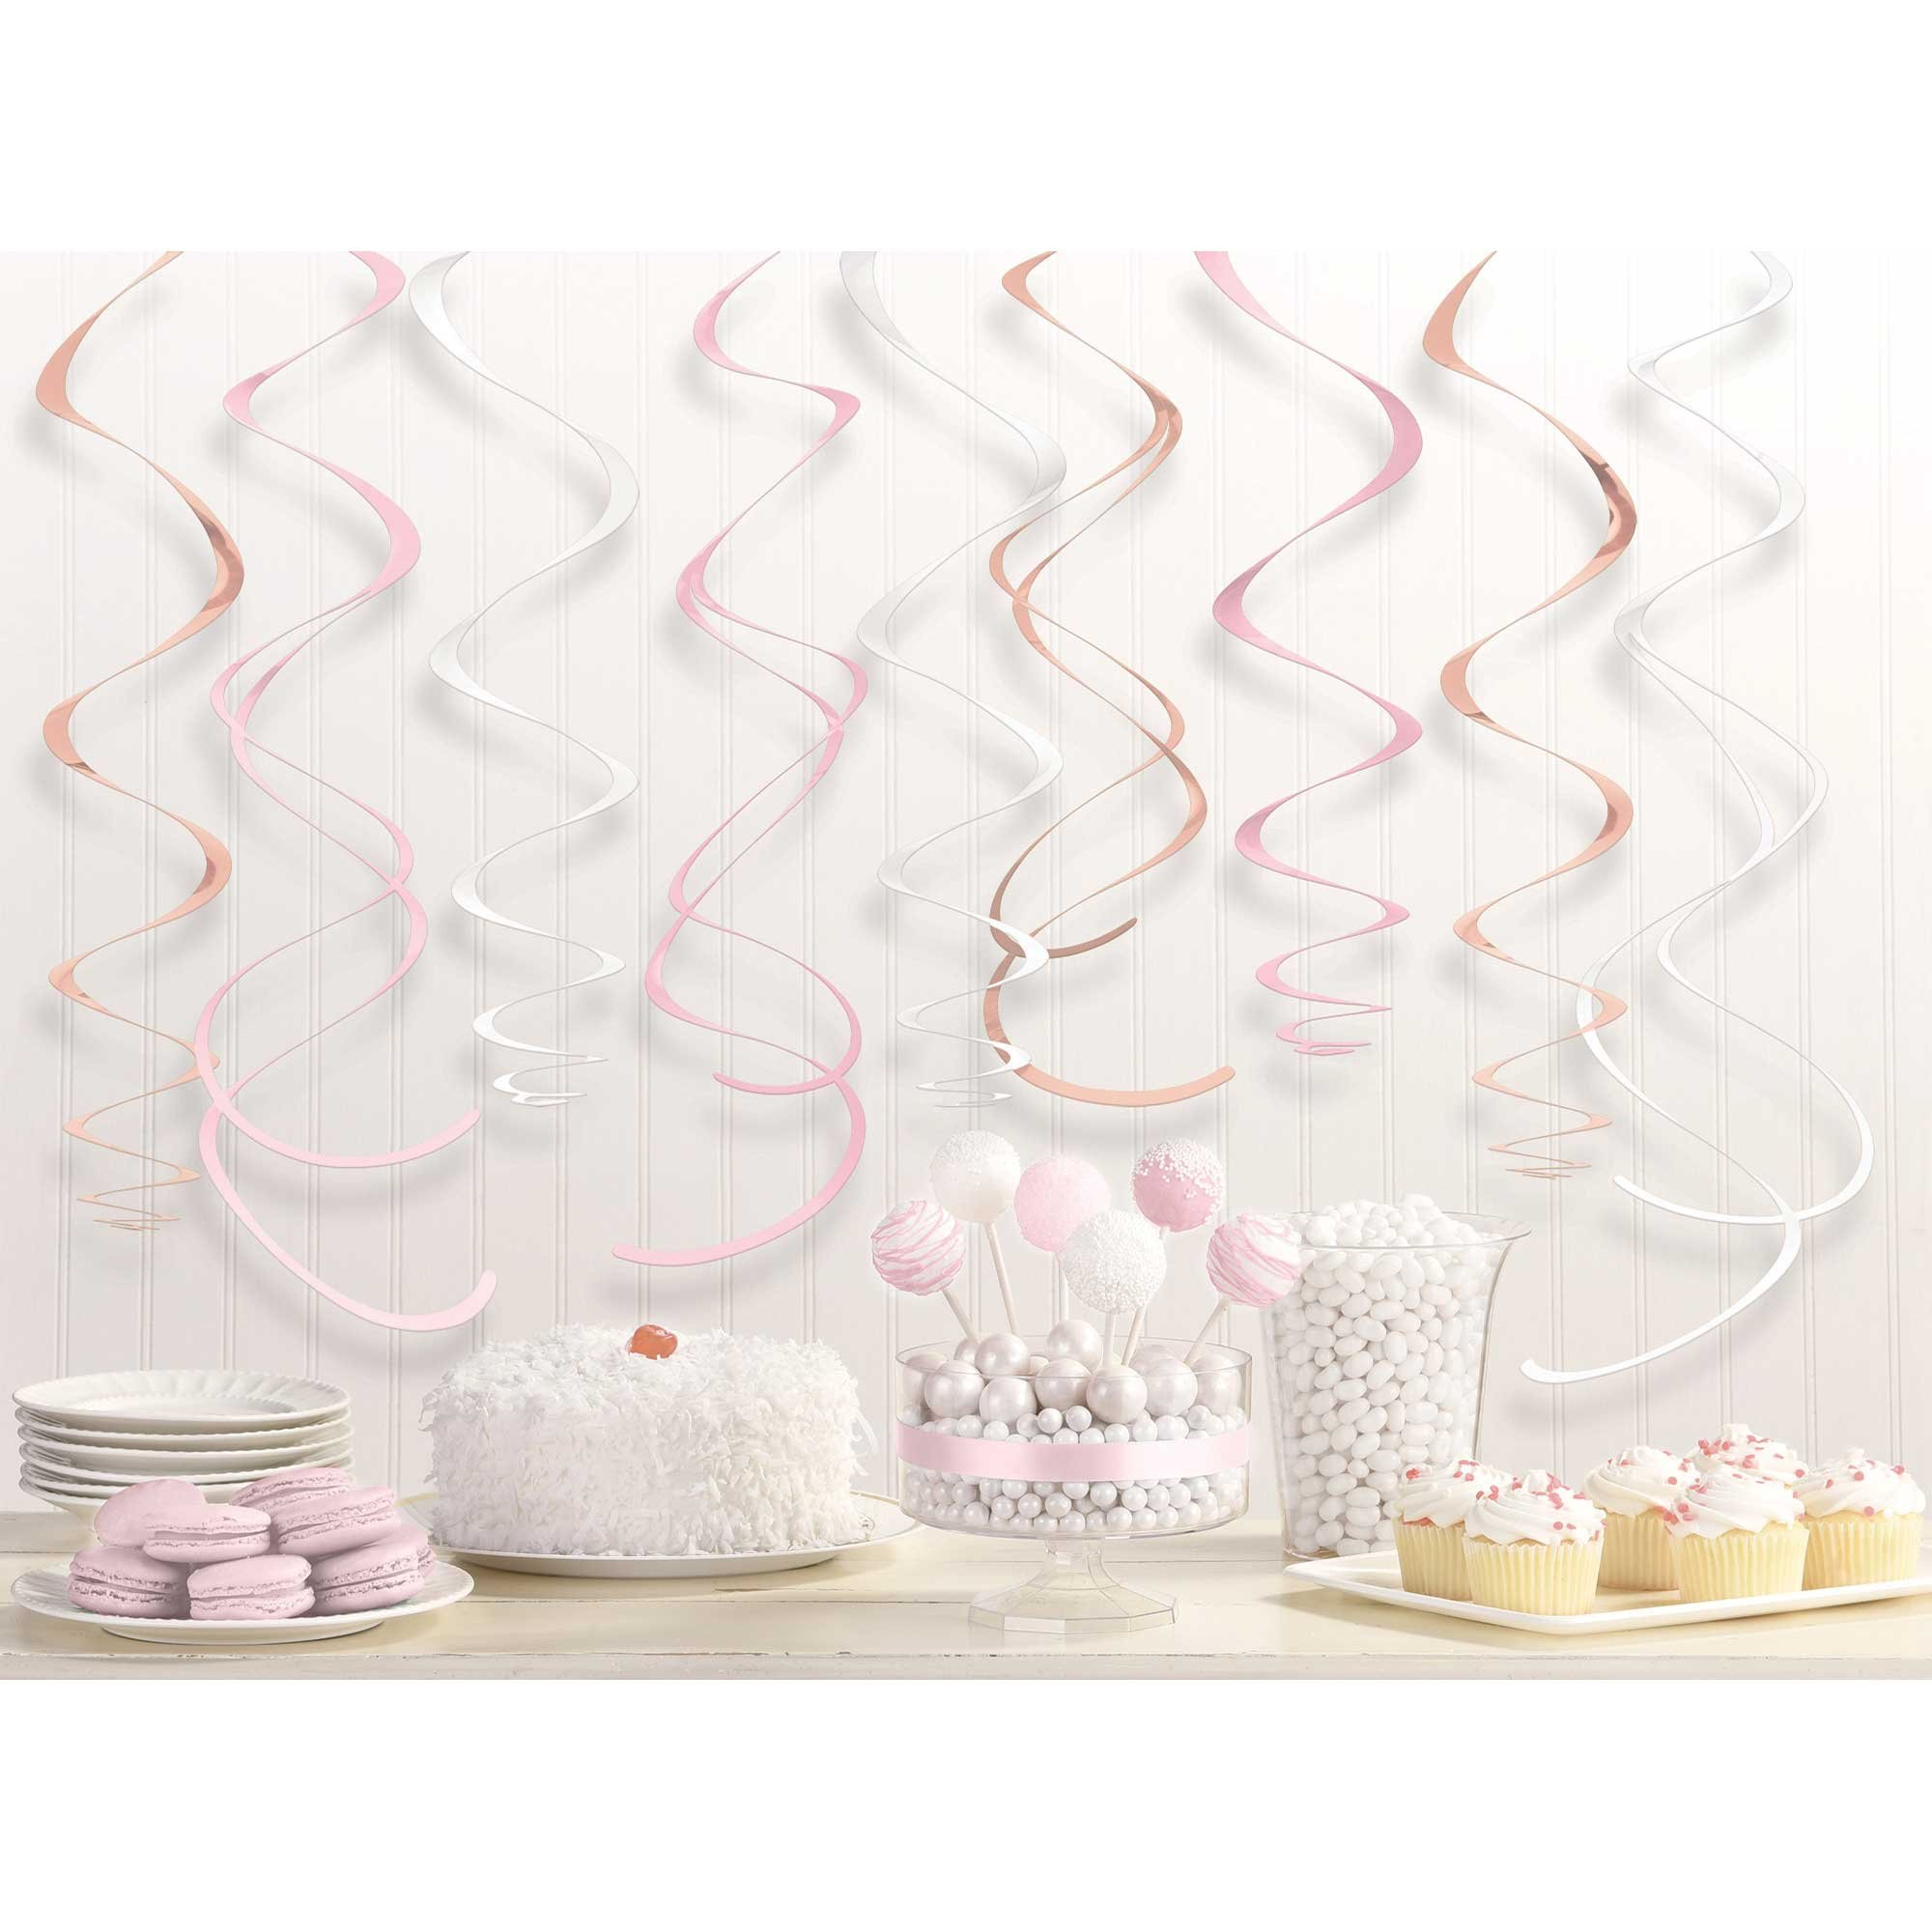 Rose Gold & Blush Hanging Swirls Decorations Foil & Plastic